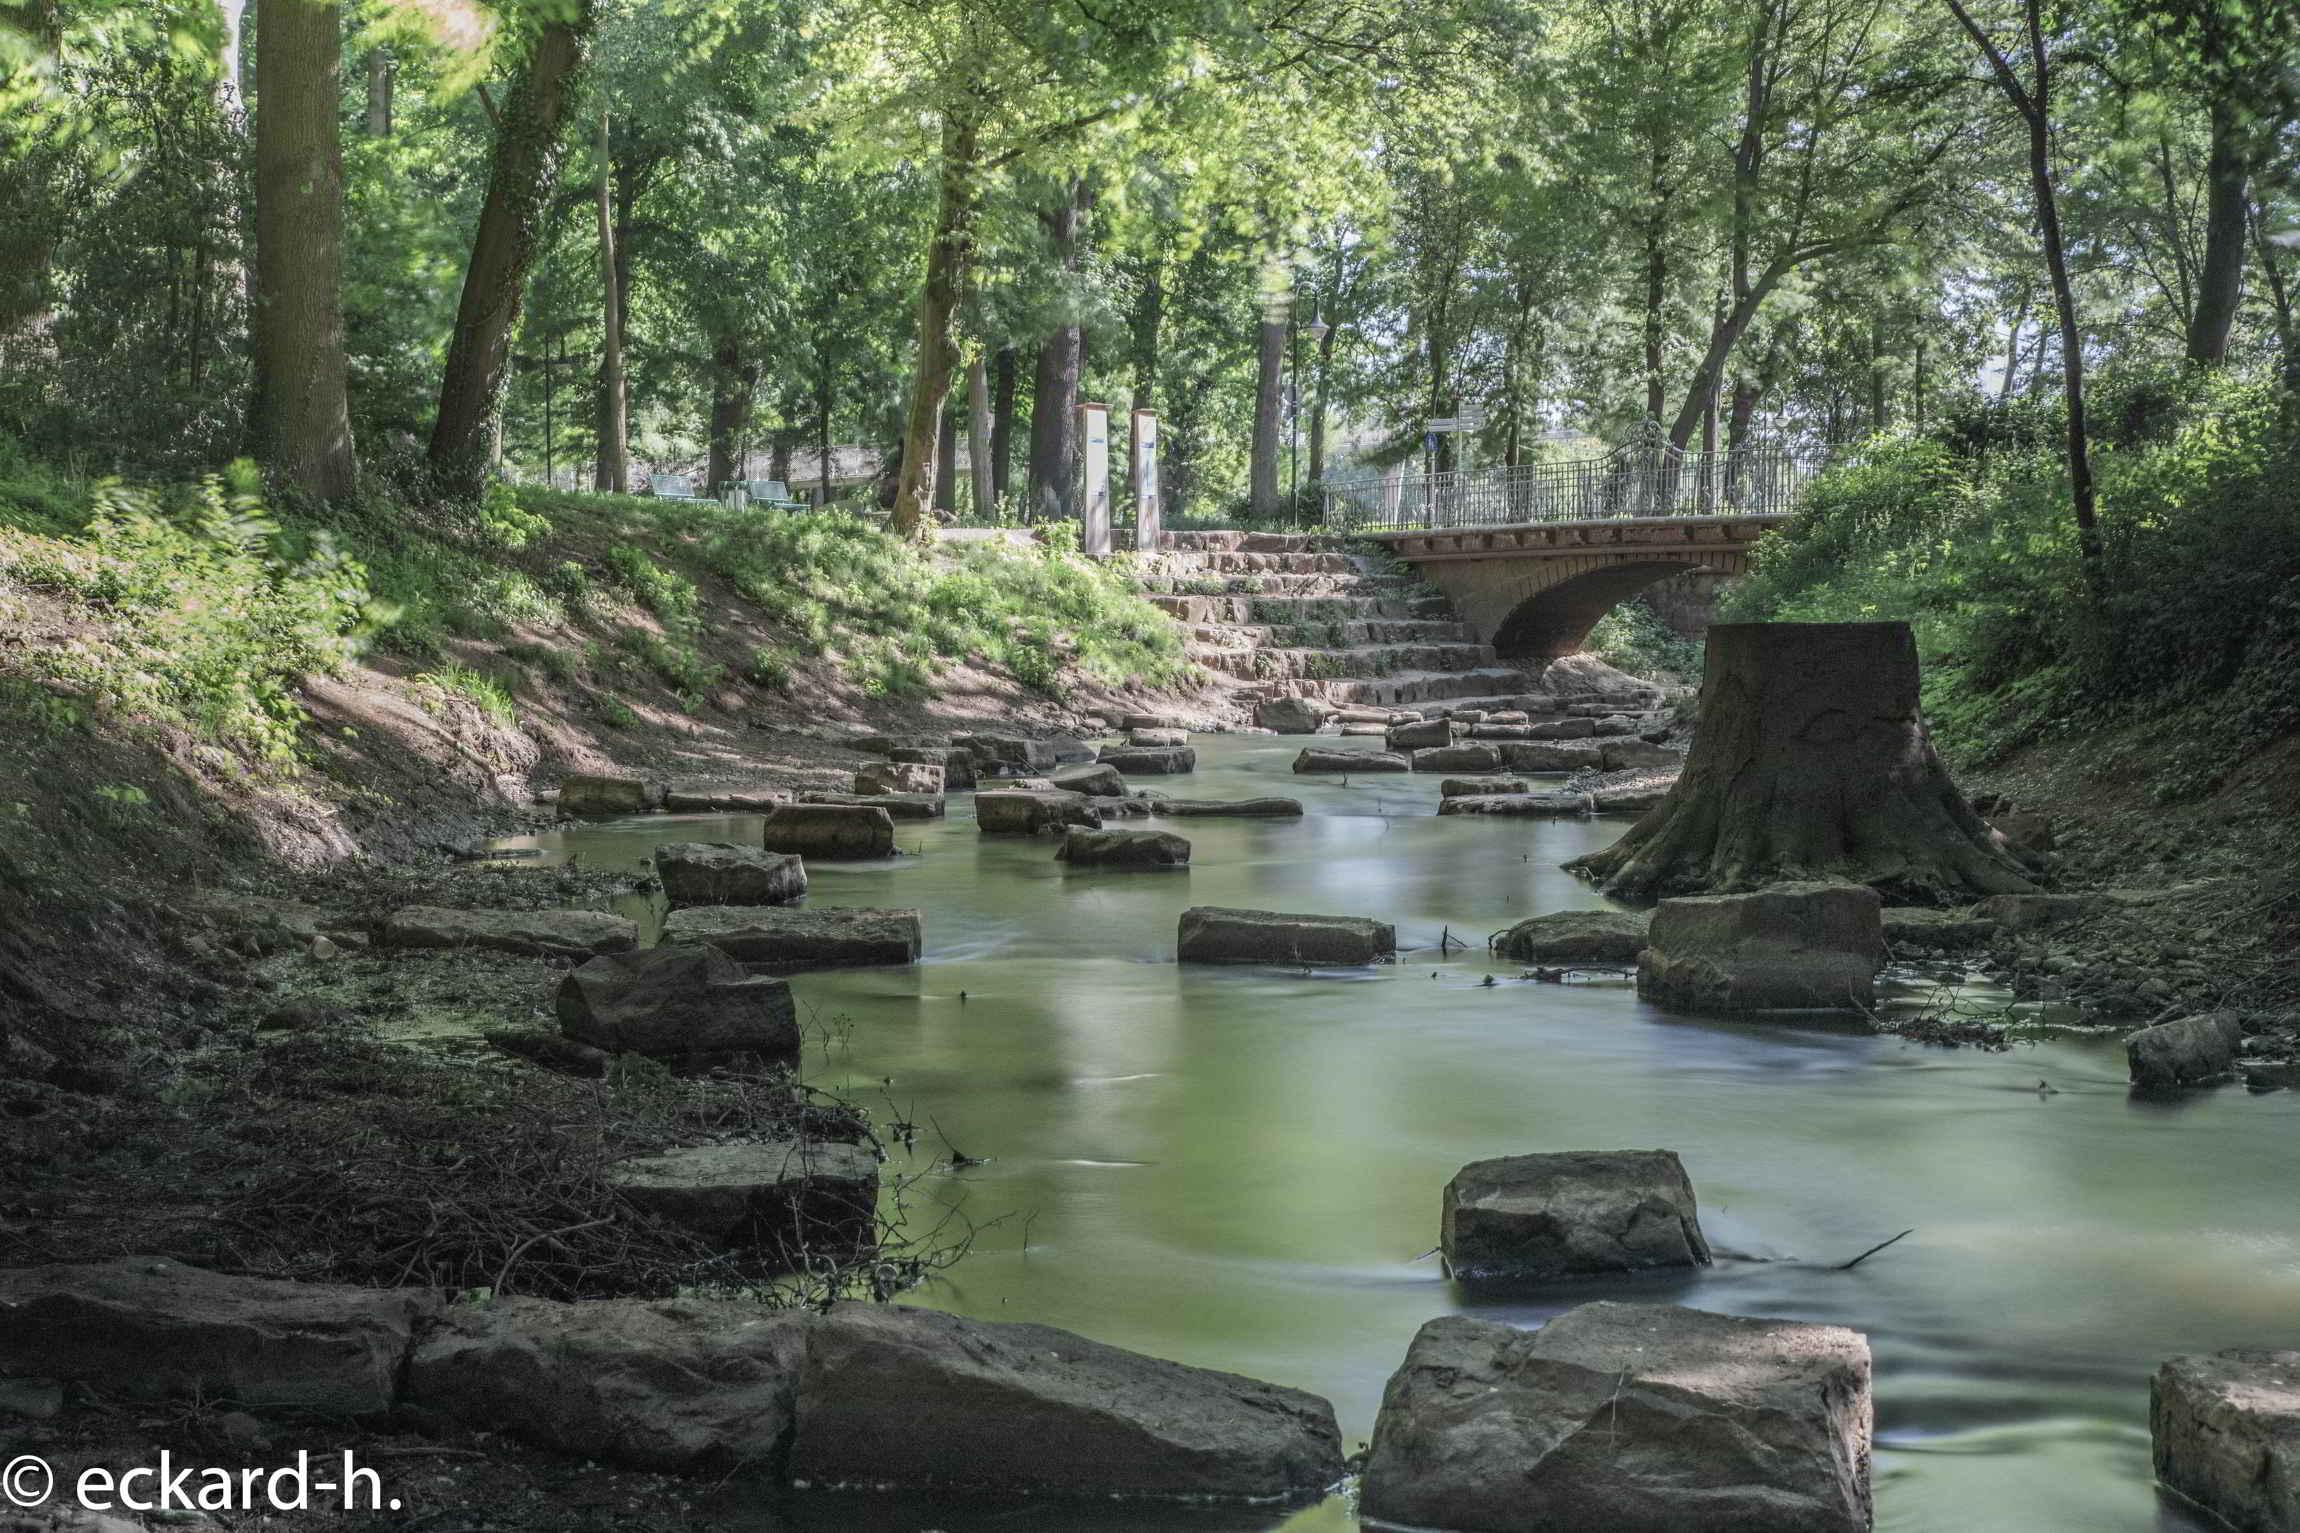 Die Bastau im Weserglacis